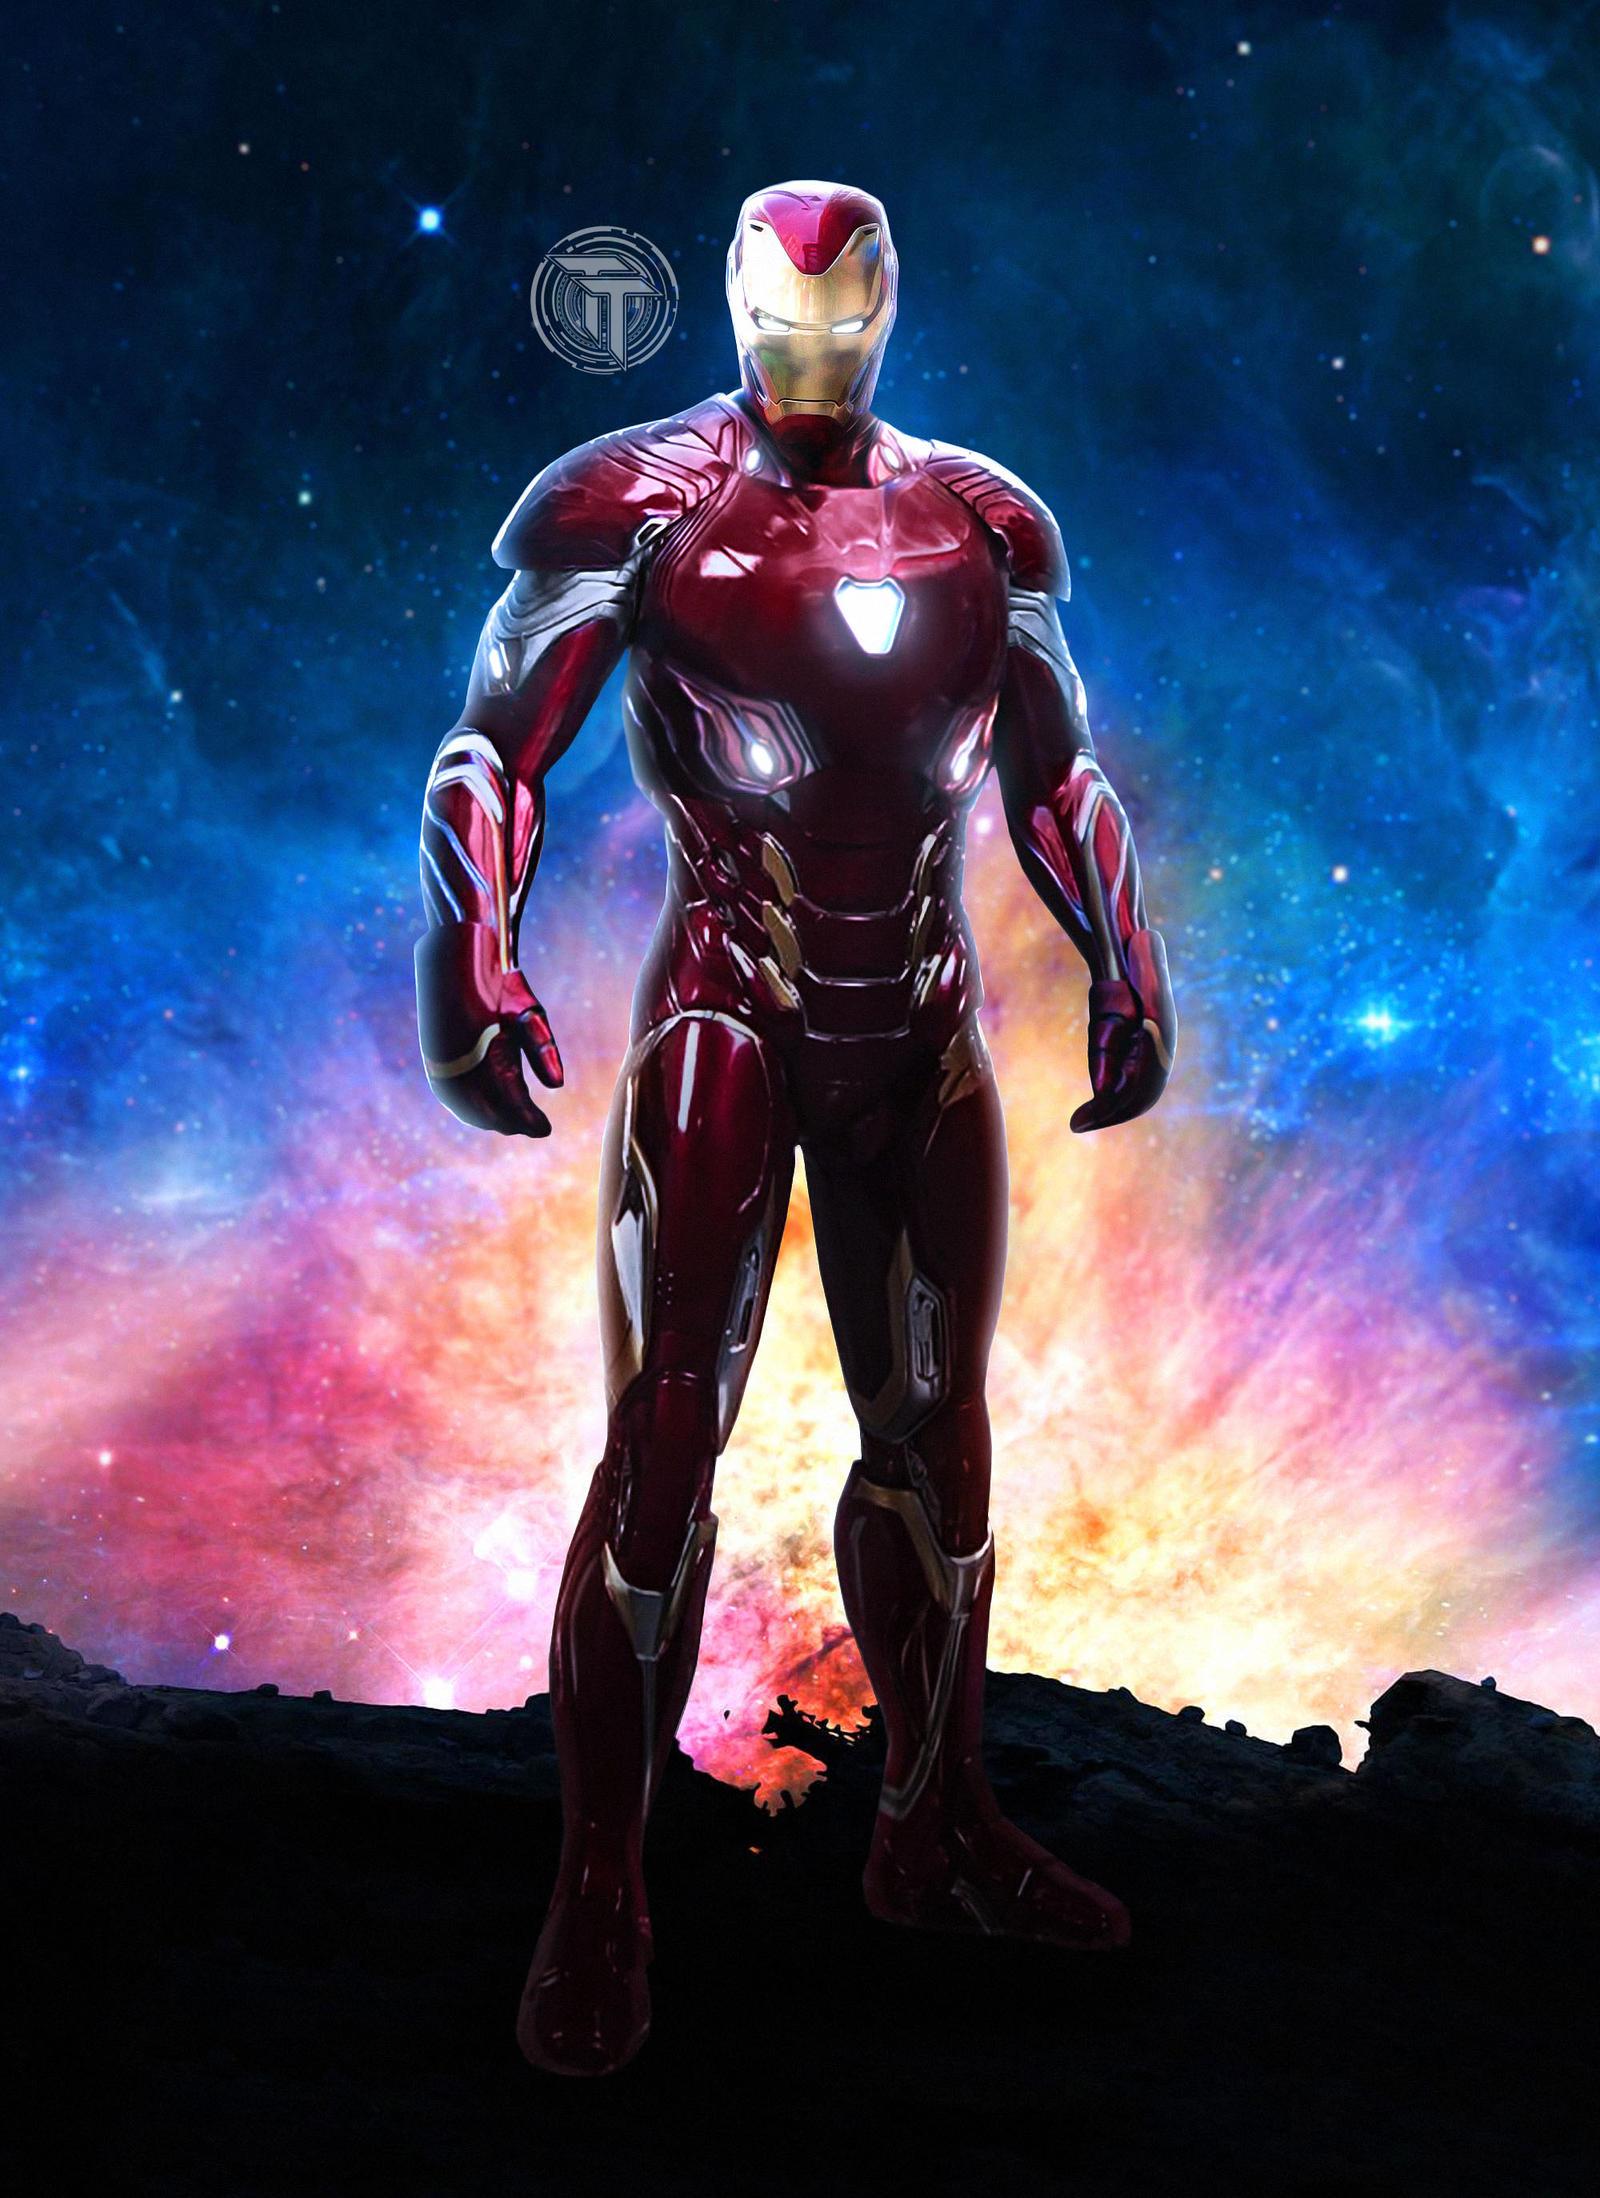 Iron Man New Armor Avengers Infinity War Mark 48 by ...